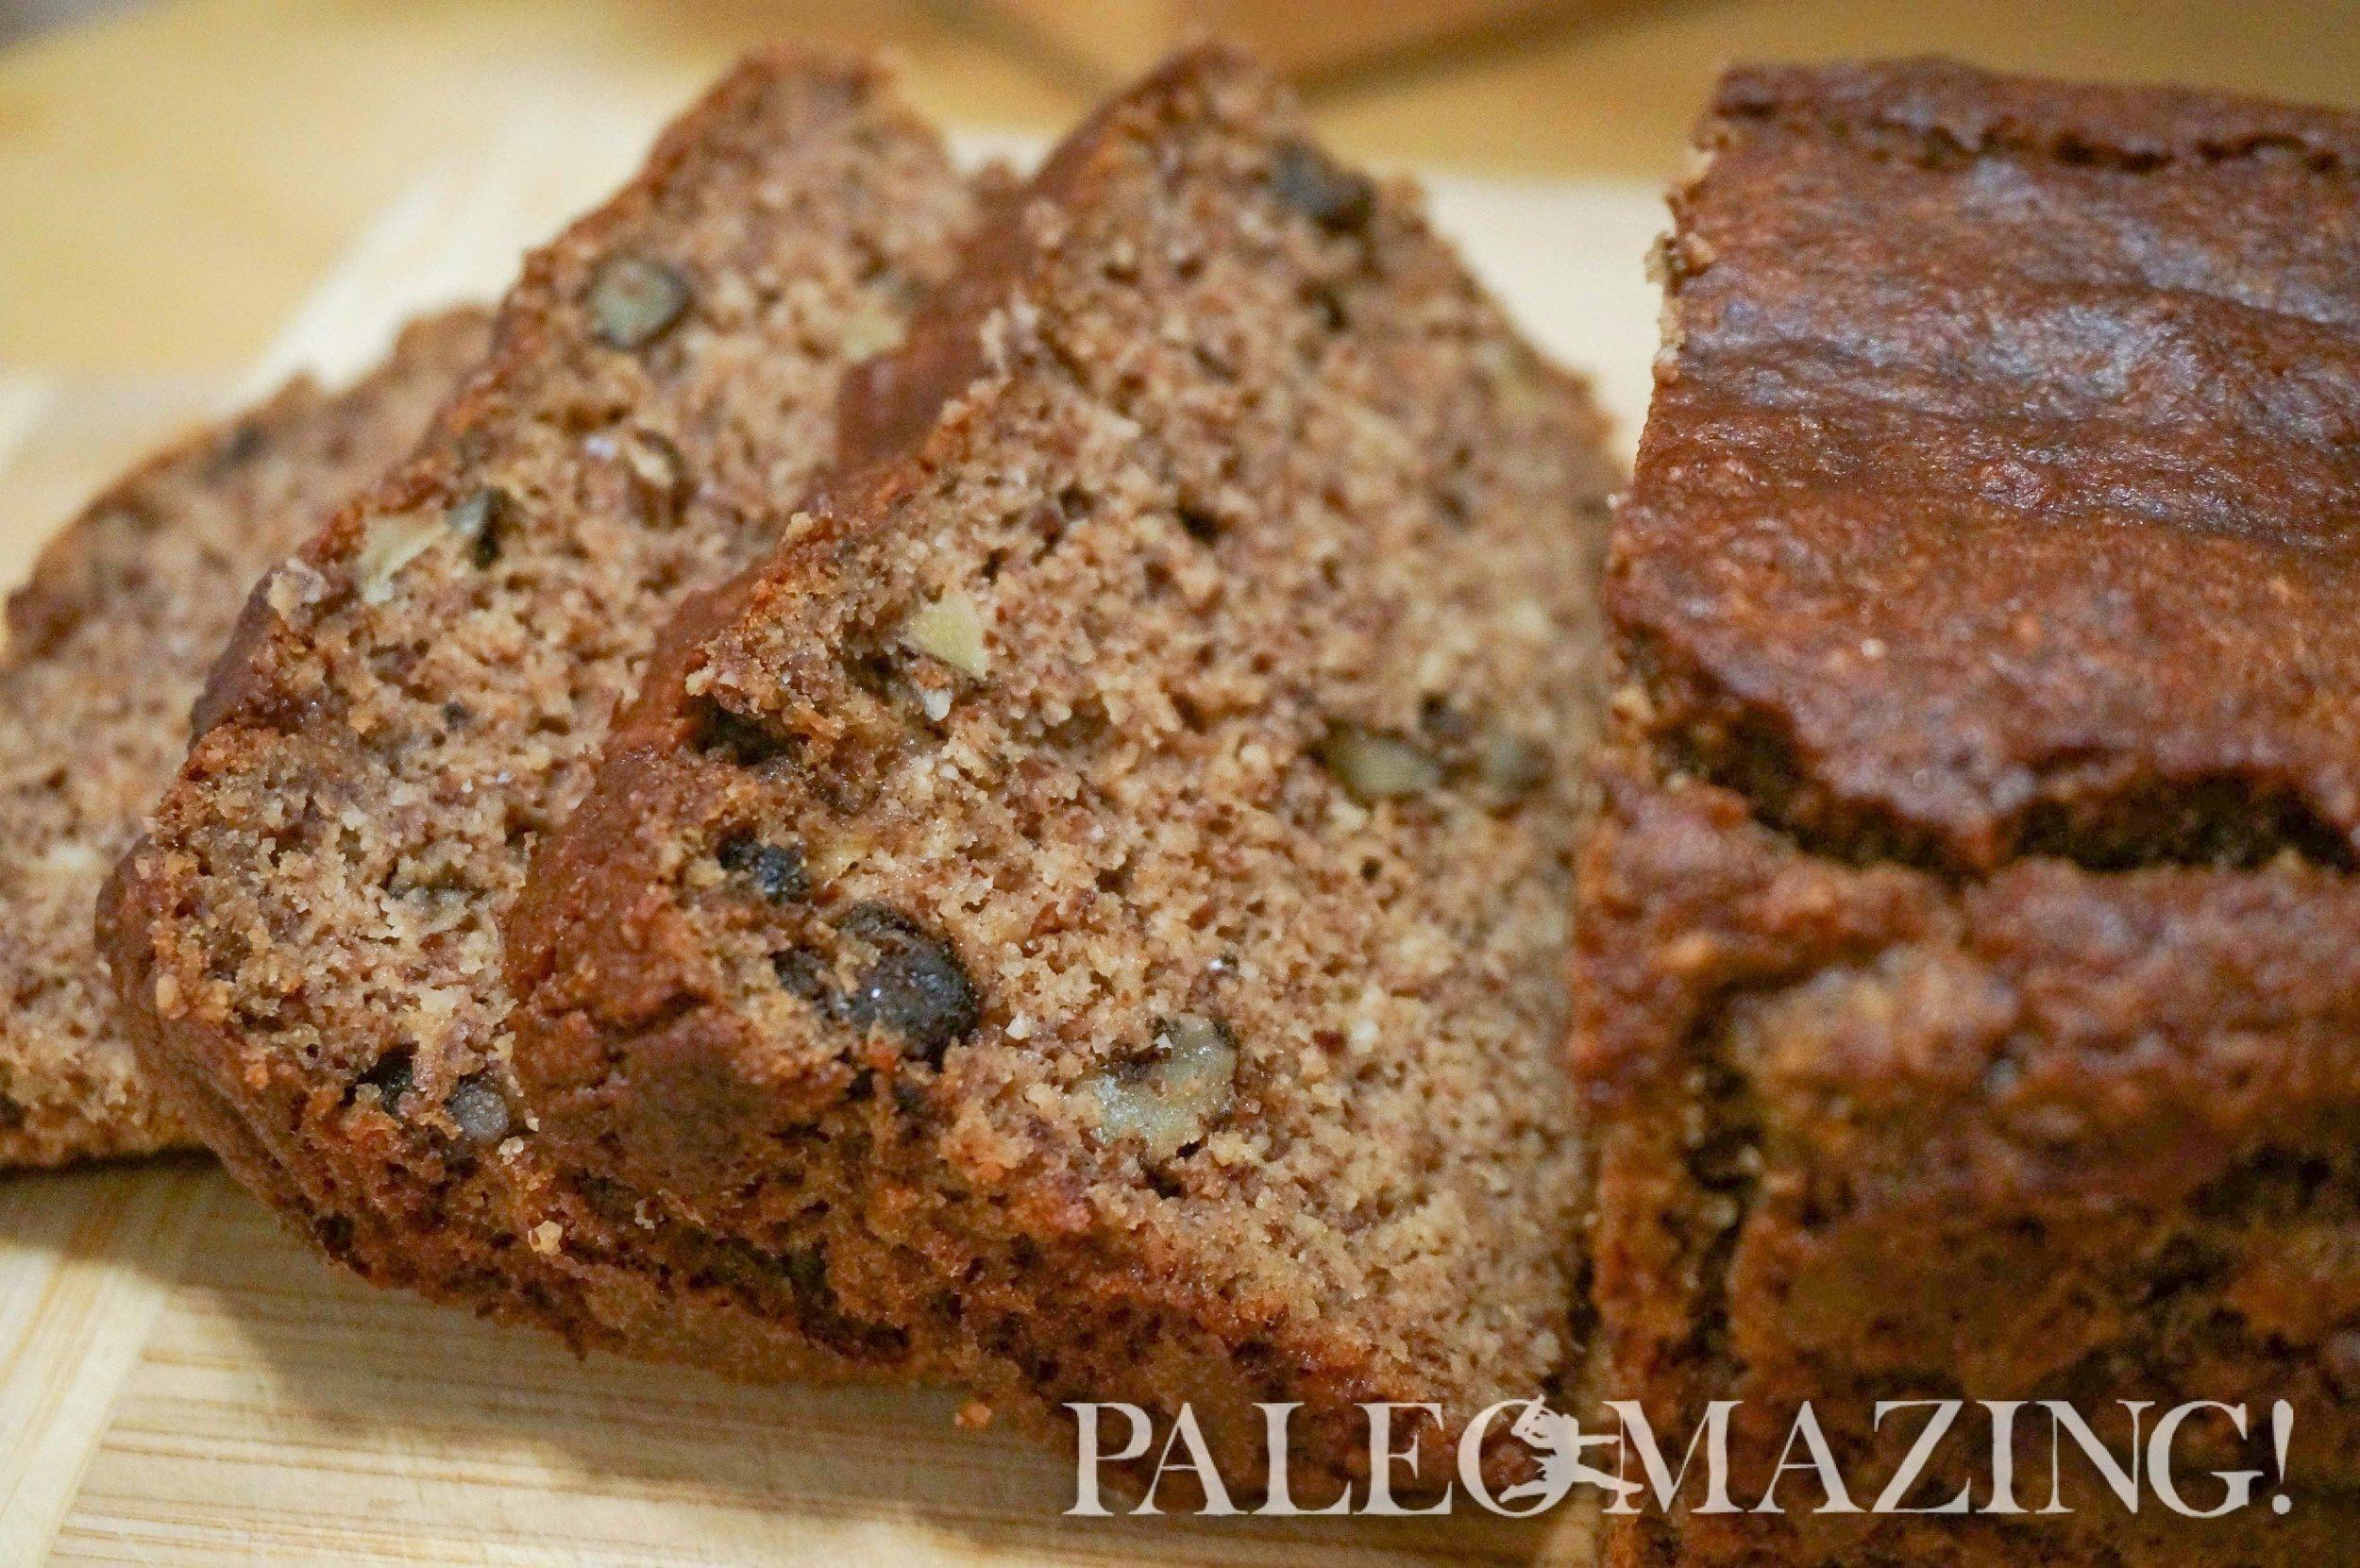 Moist Paleo banana bread - from Paleomazing.com